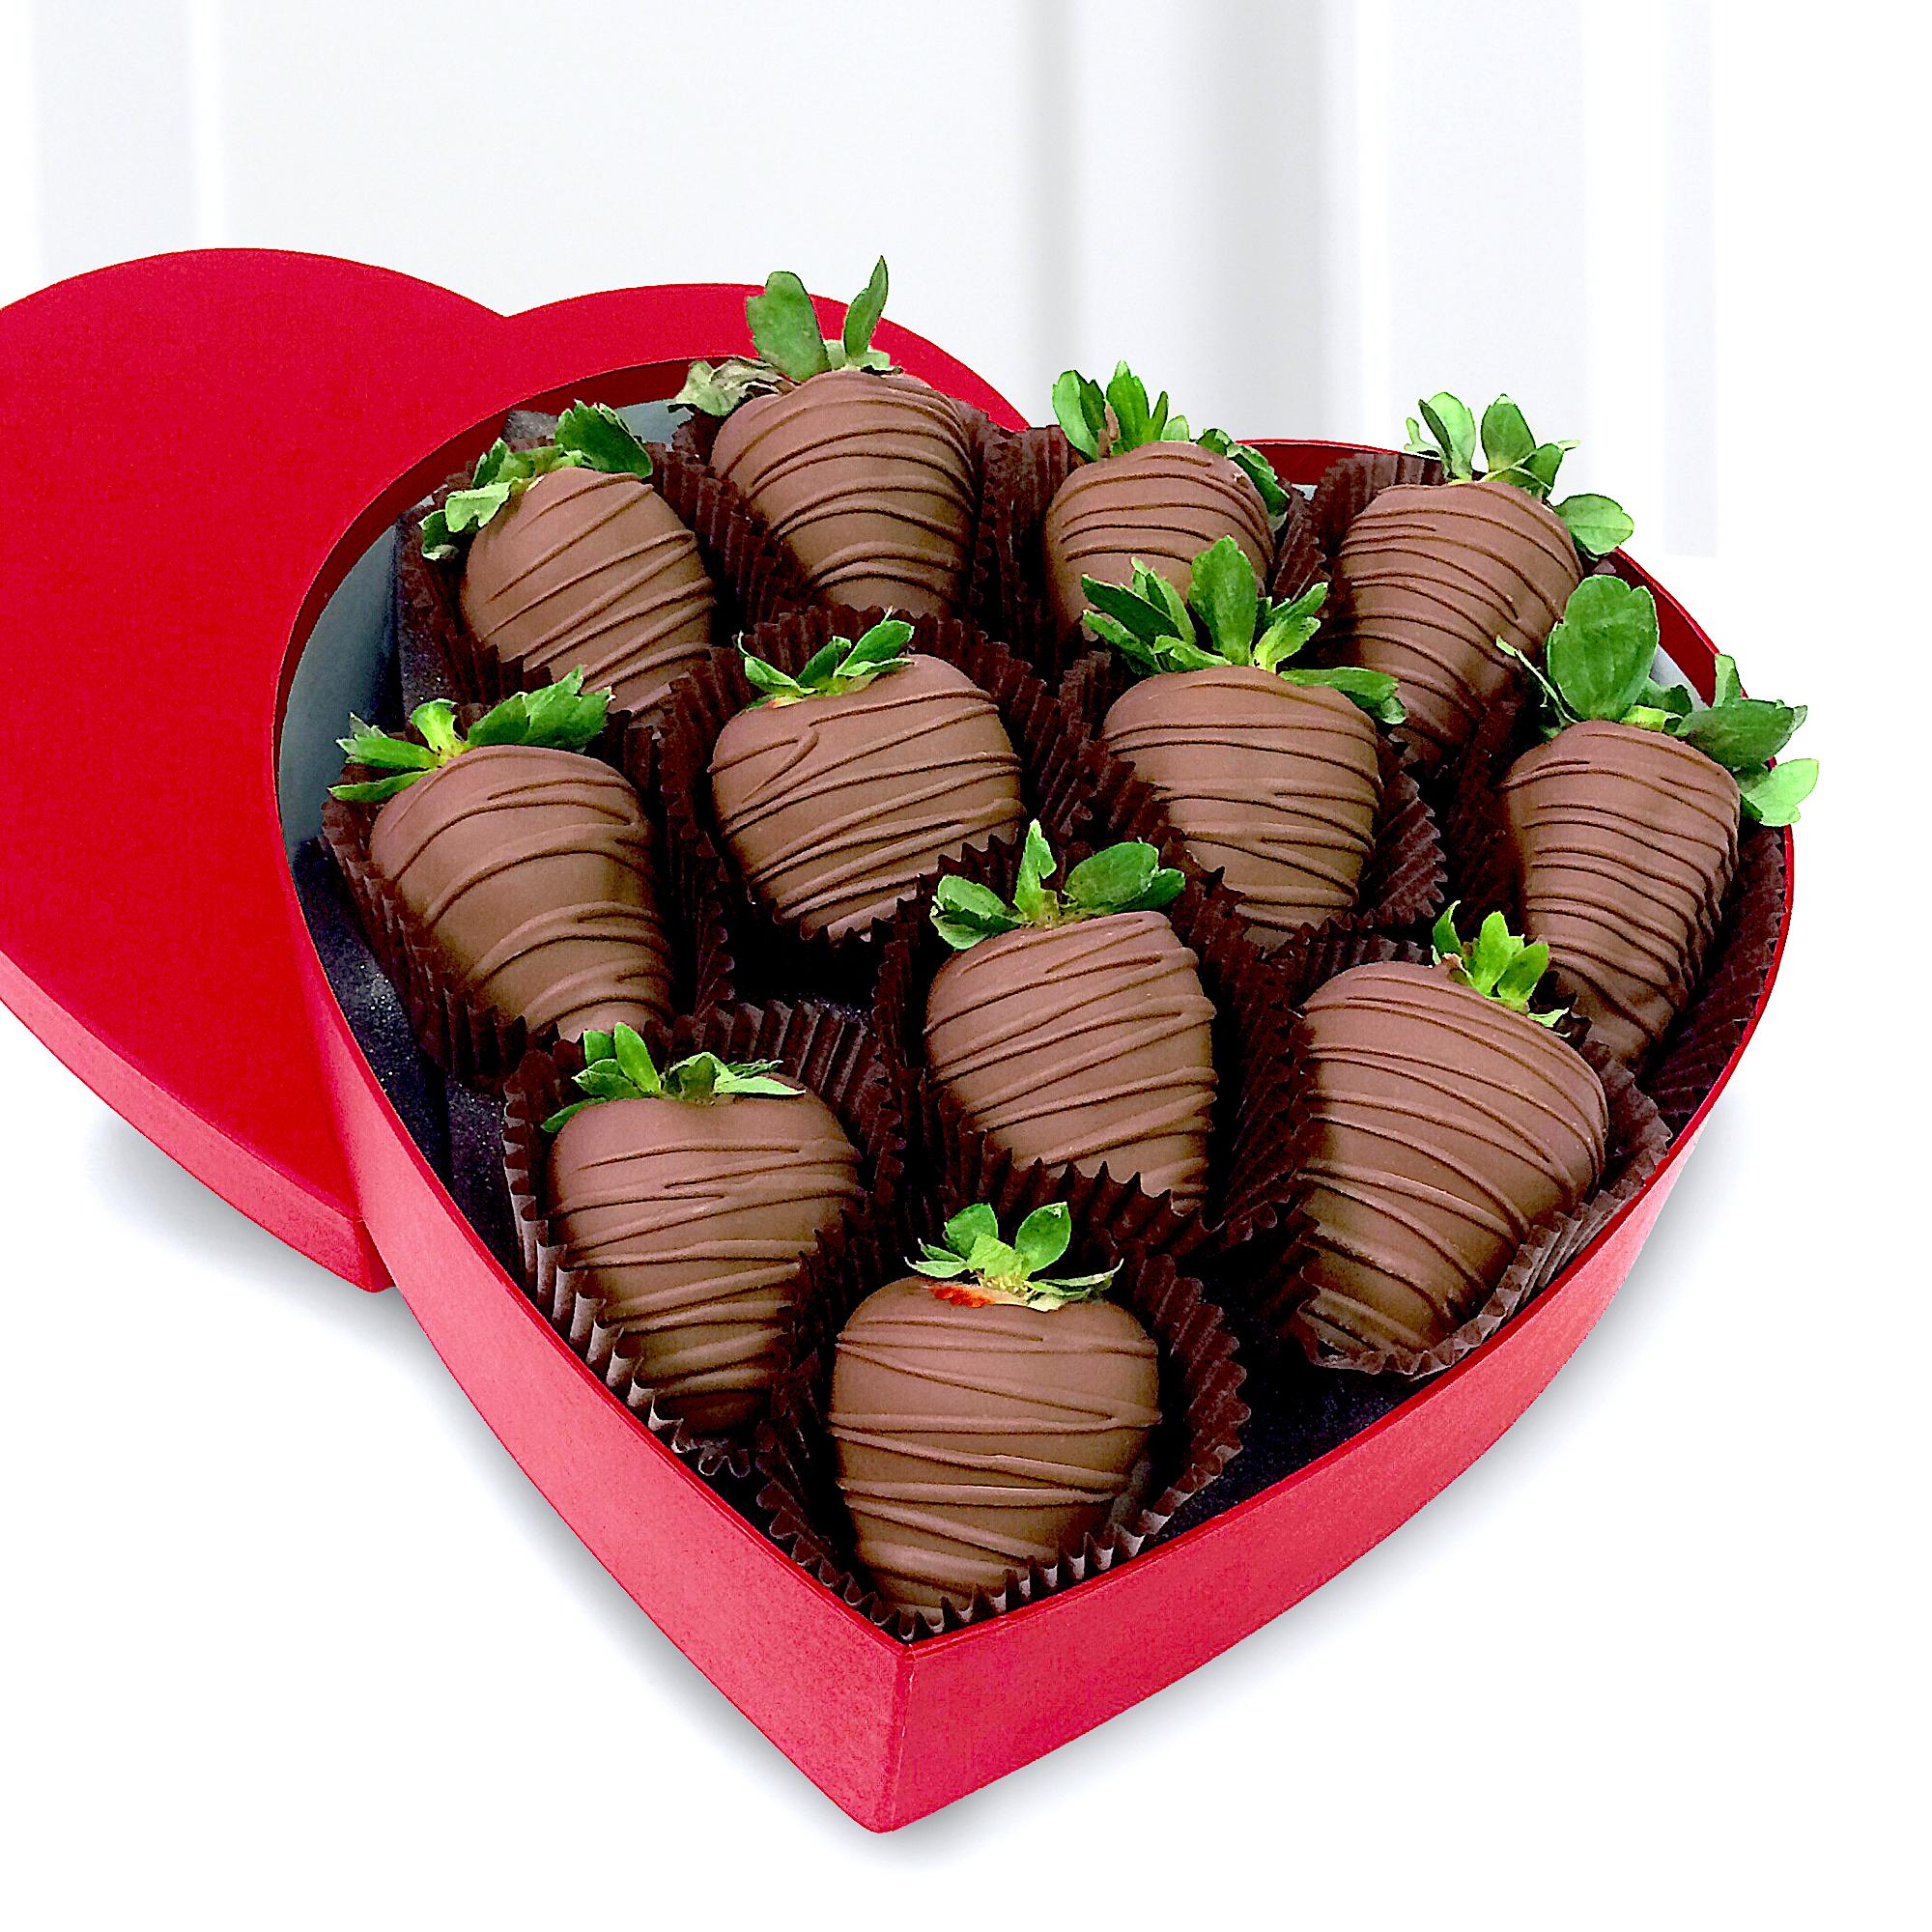 Decadent Dozen Chocolate Dipped Strawberries Delivered in Miami